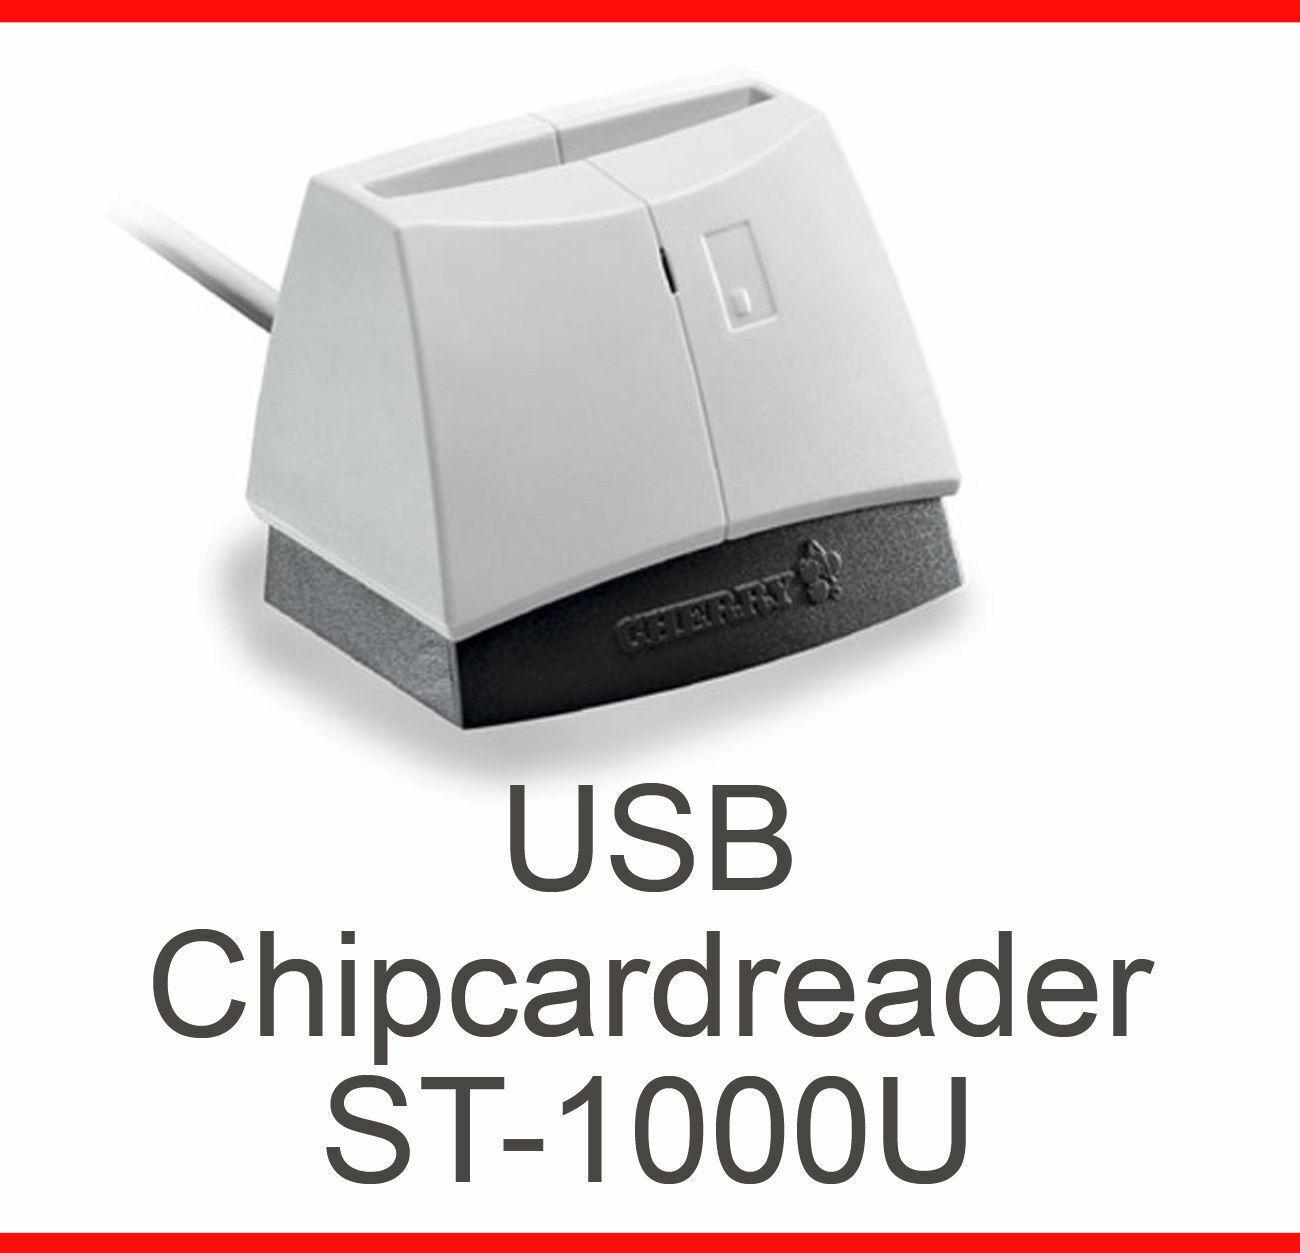 USB Cardreader Cherry ST-1000U Cardman 2020 Hbci Windows 98 XP 2000 Vista 7 8 10